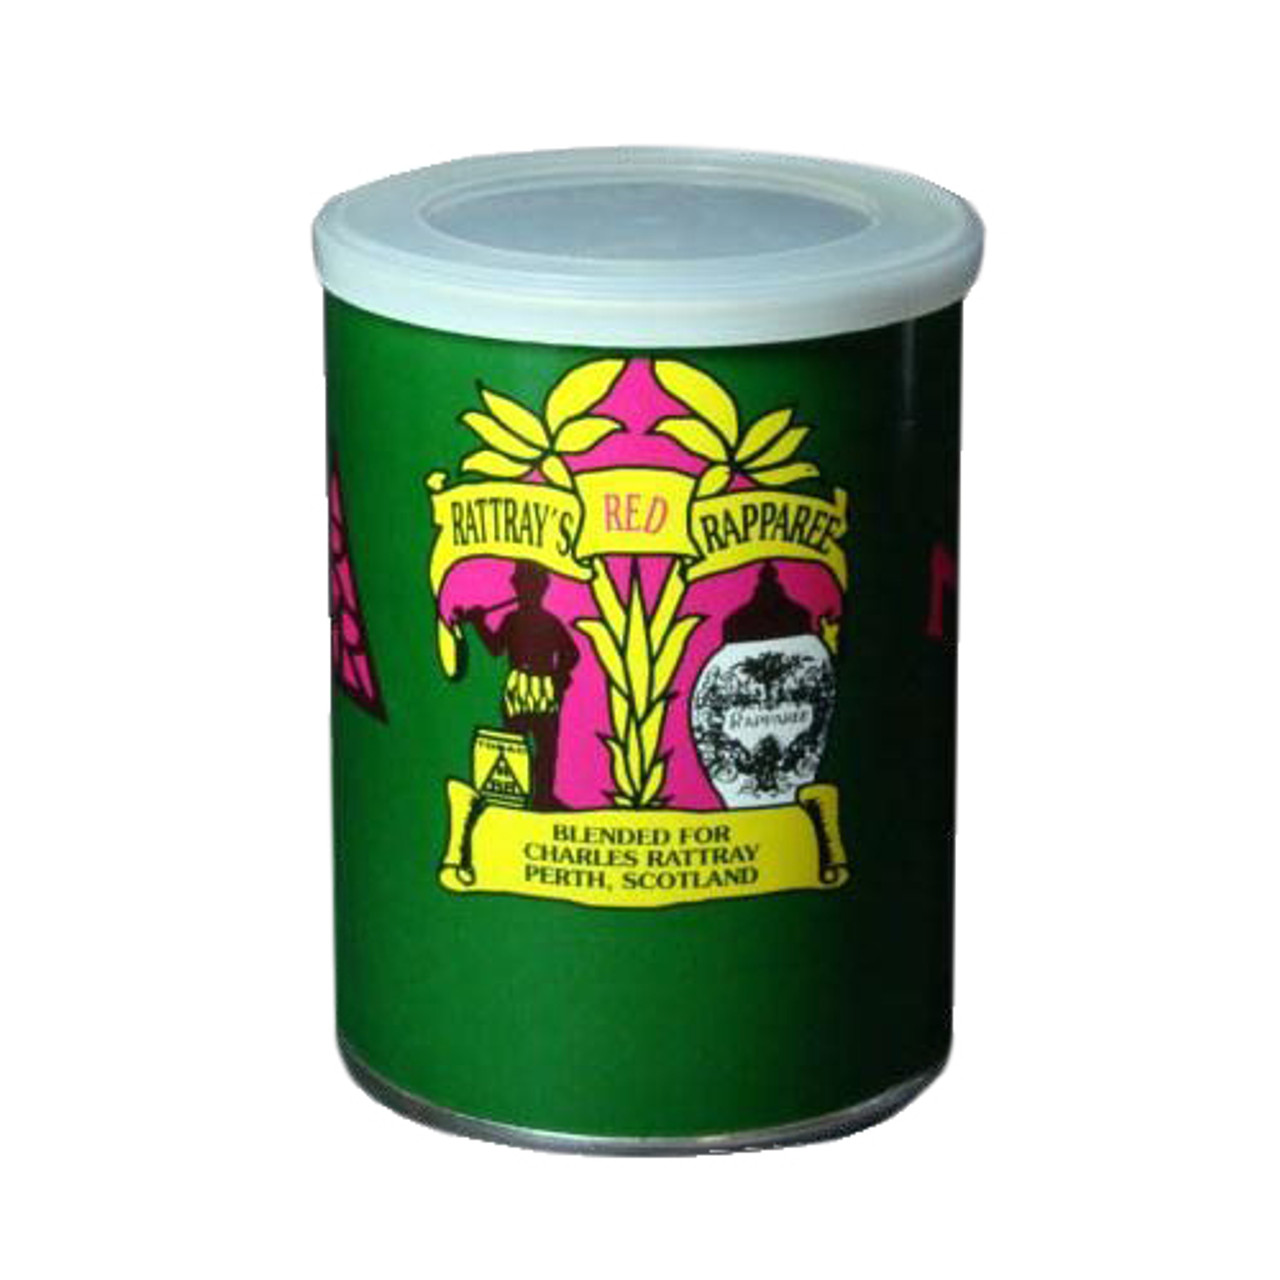 Rattray's Red Rapparee Pipe Tobacco | 3.5 OZ TIN